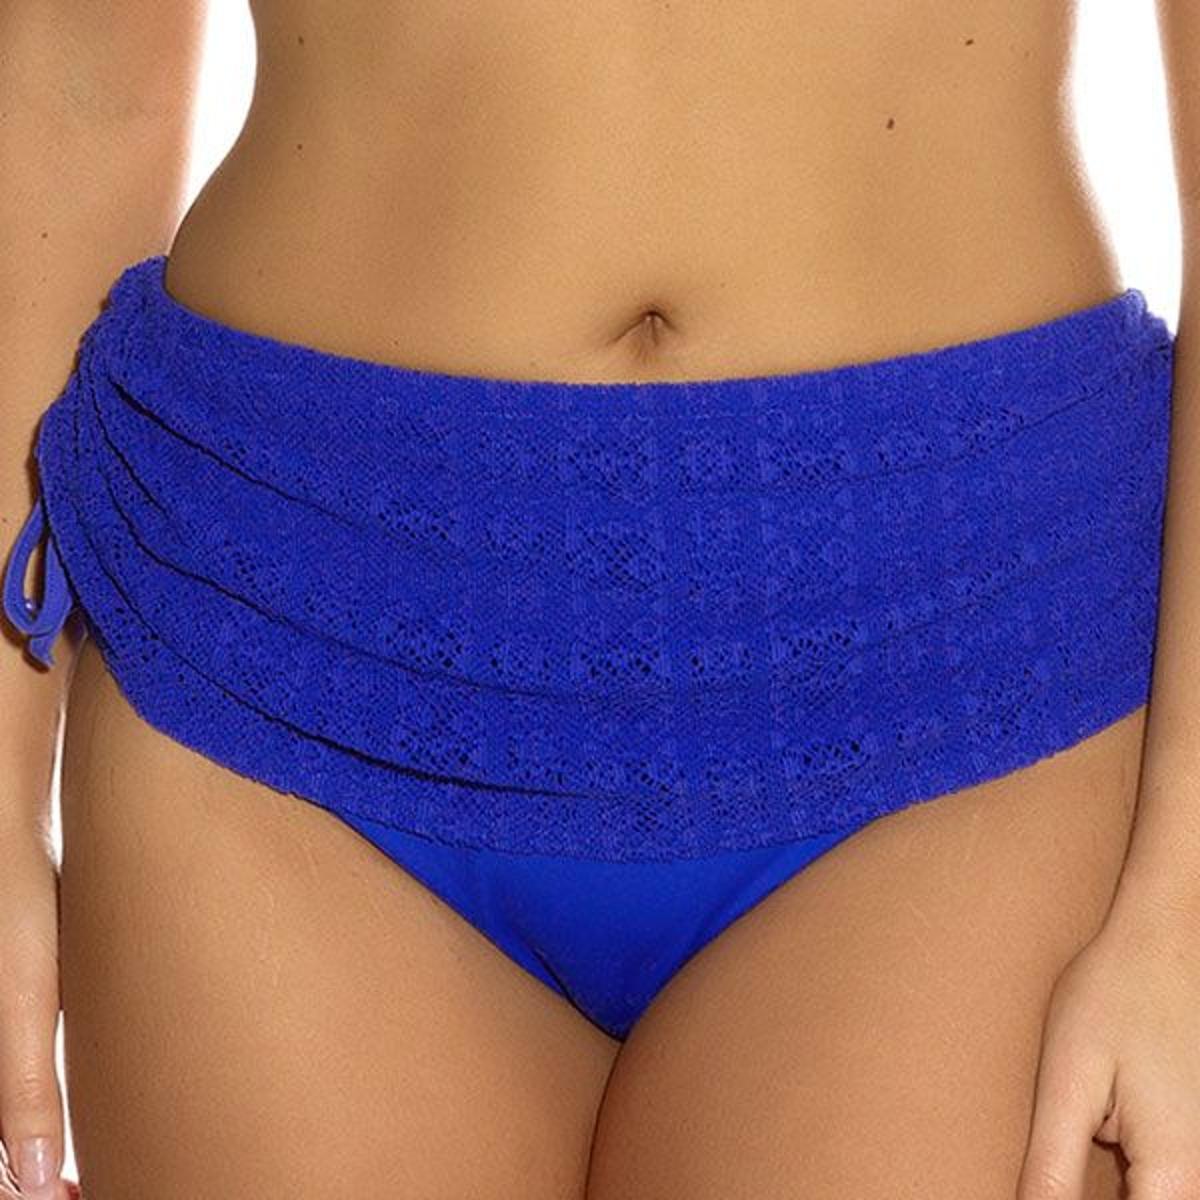 Slip de bain jupette ajustable Elomi KISSIMMEE royal blue XL